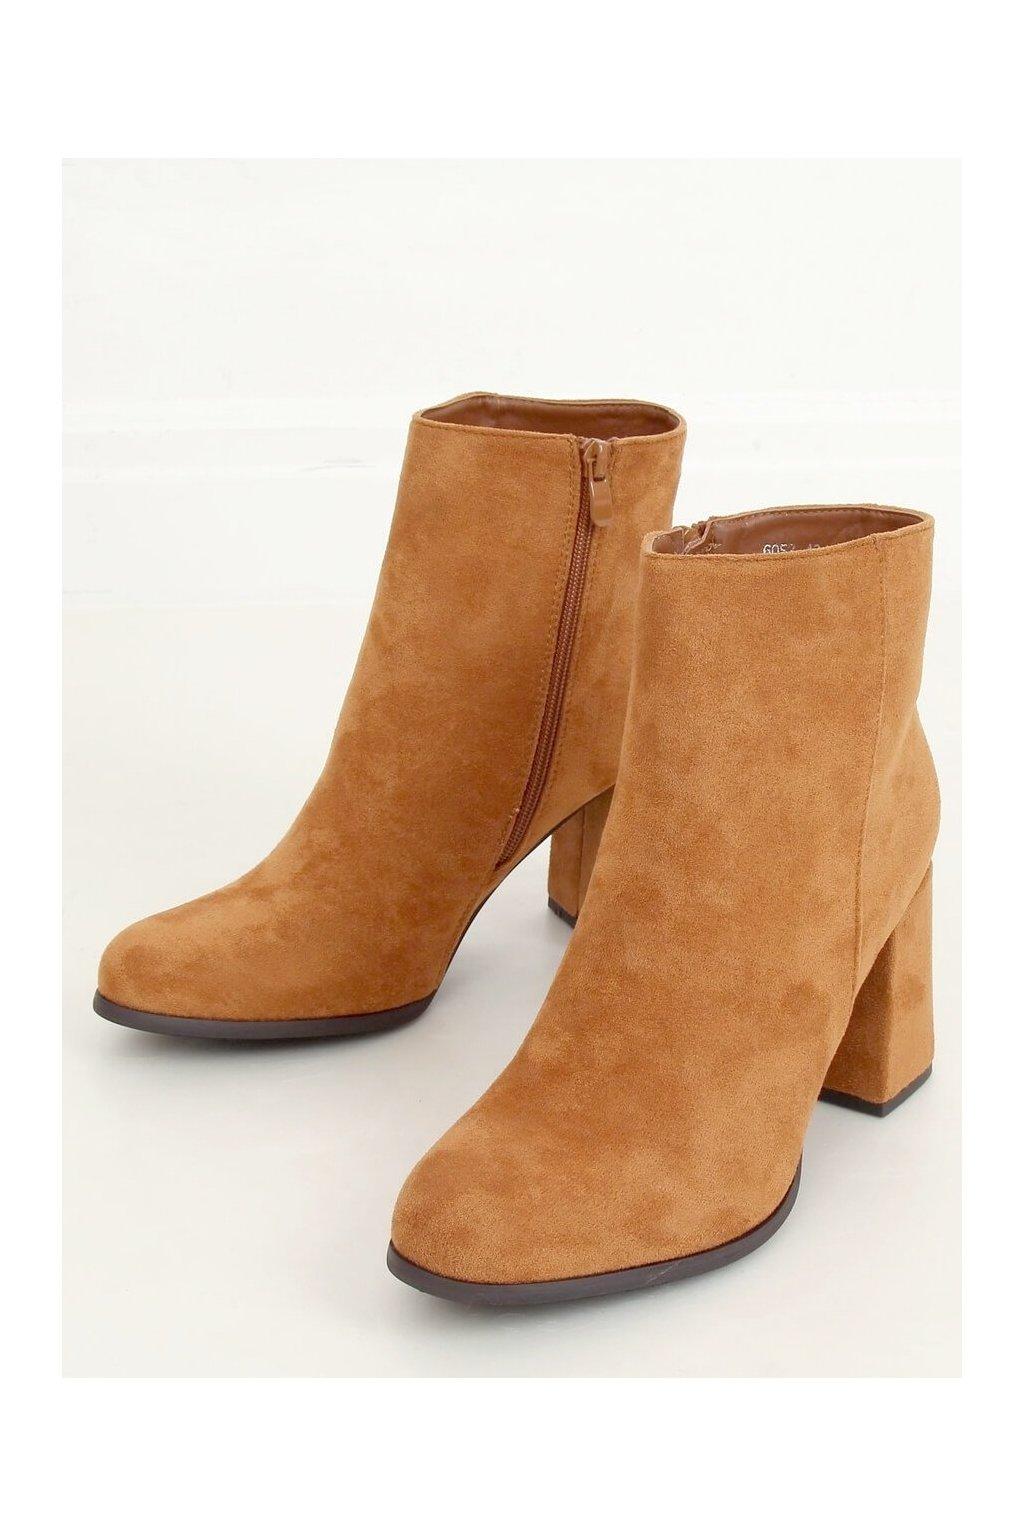 Dámske členkové topánky hnedé na širokom podpätku 6053